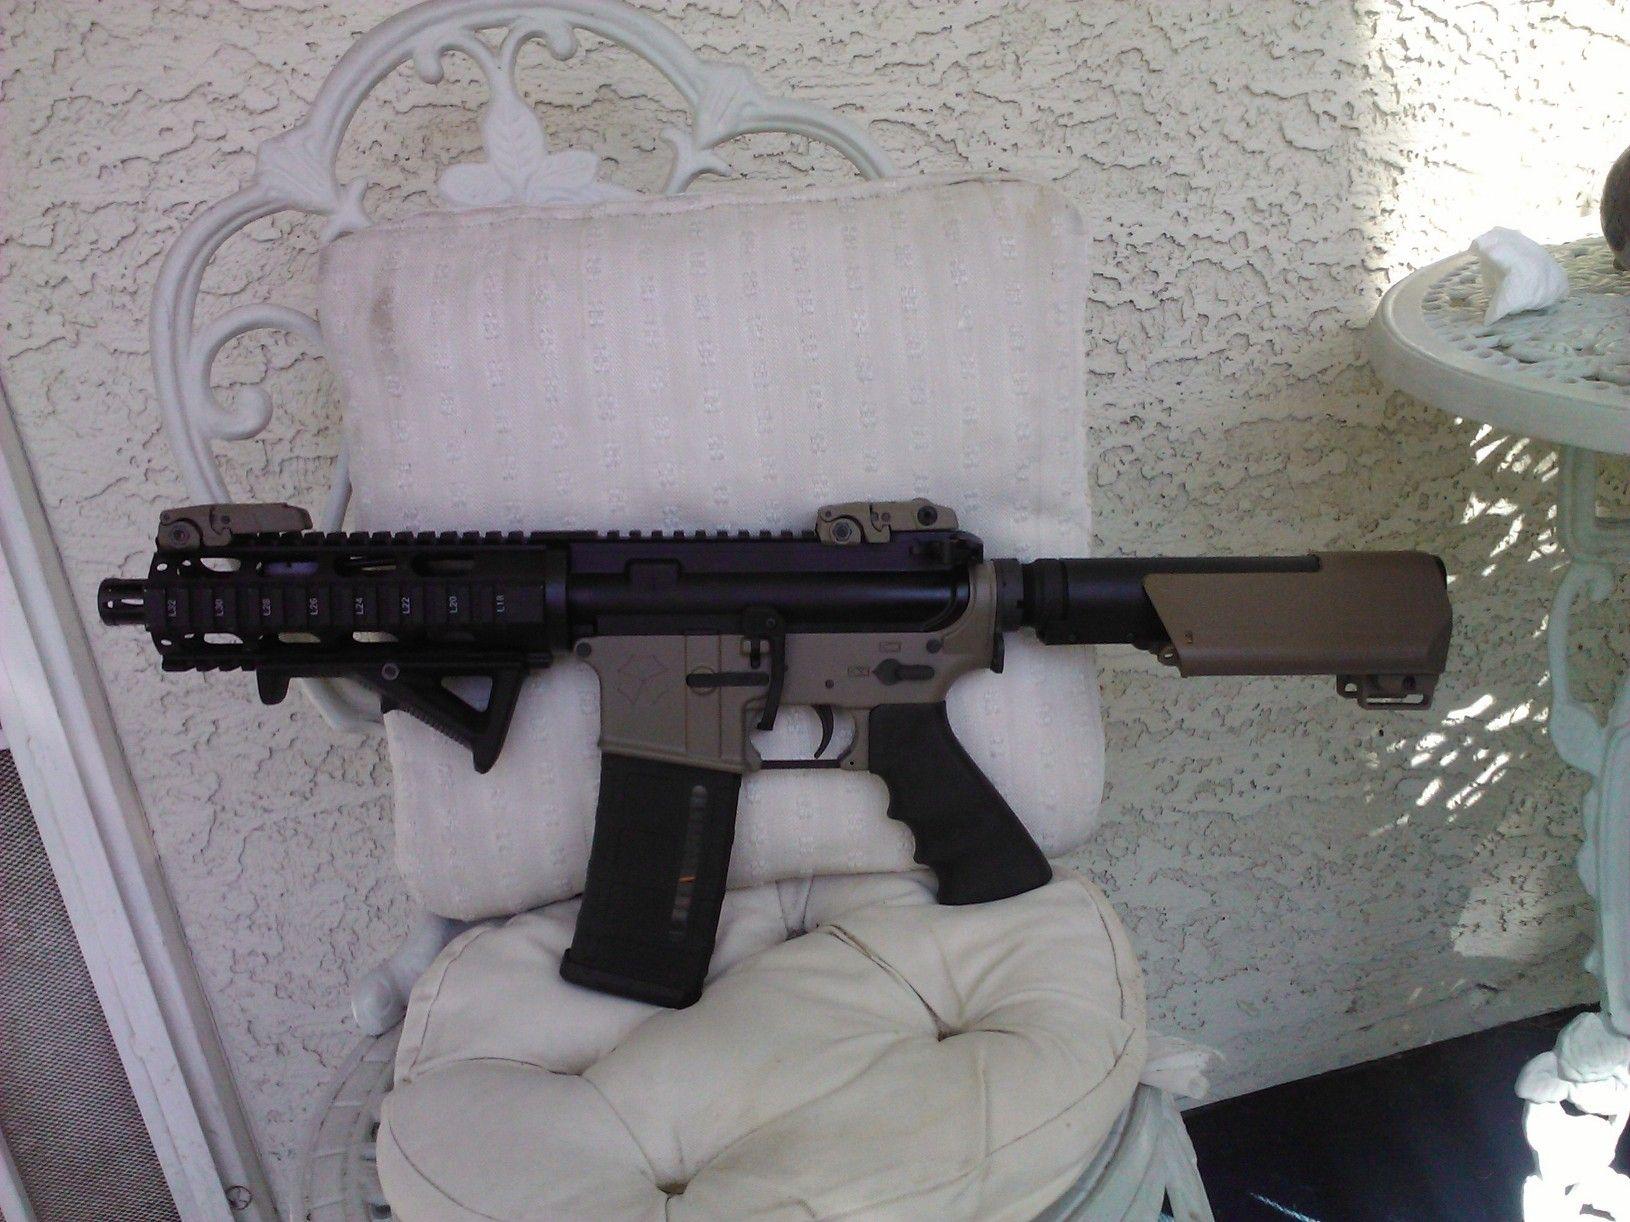 AR15 pistol, Magpul flip up sights, FDE UCWRG lower